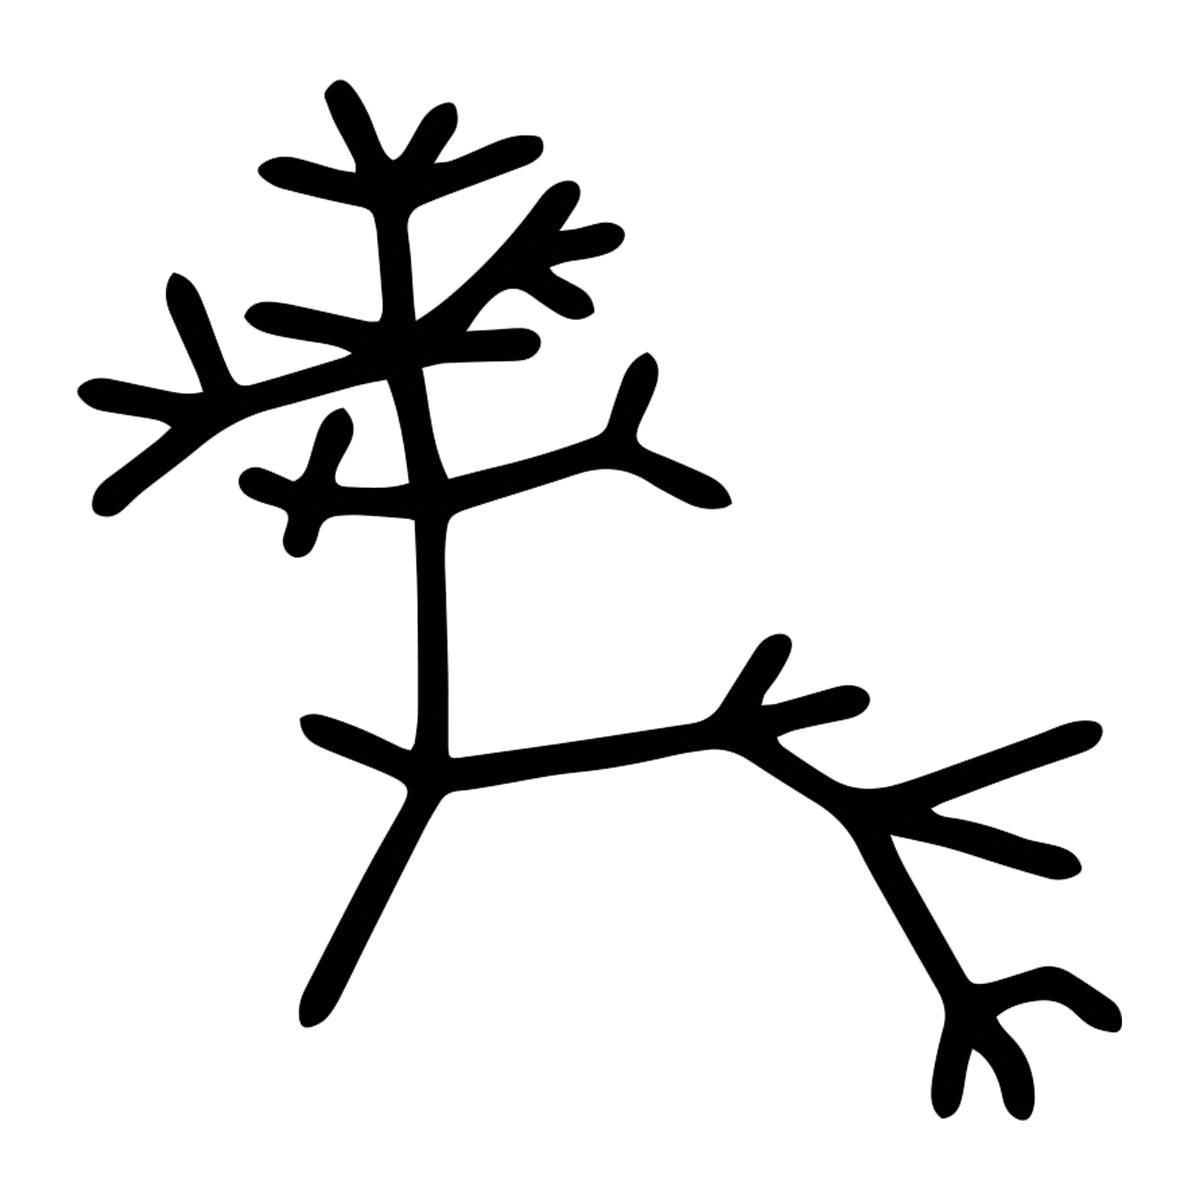 Darwin Tree of Life Outline Weatherproof Vinyl Decal